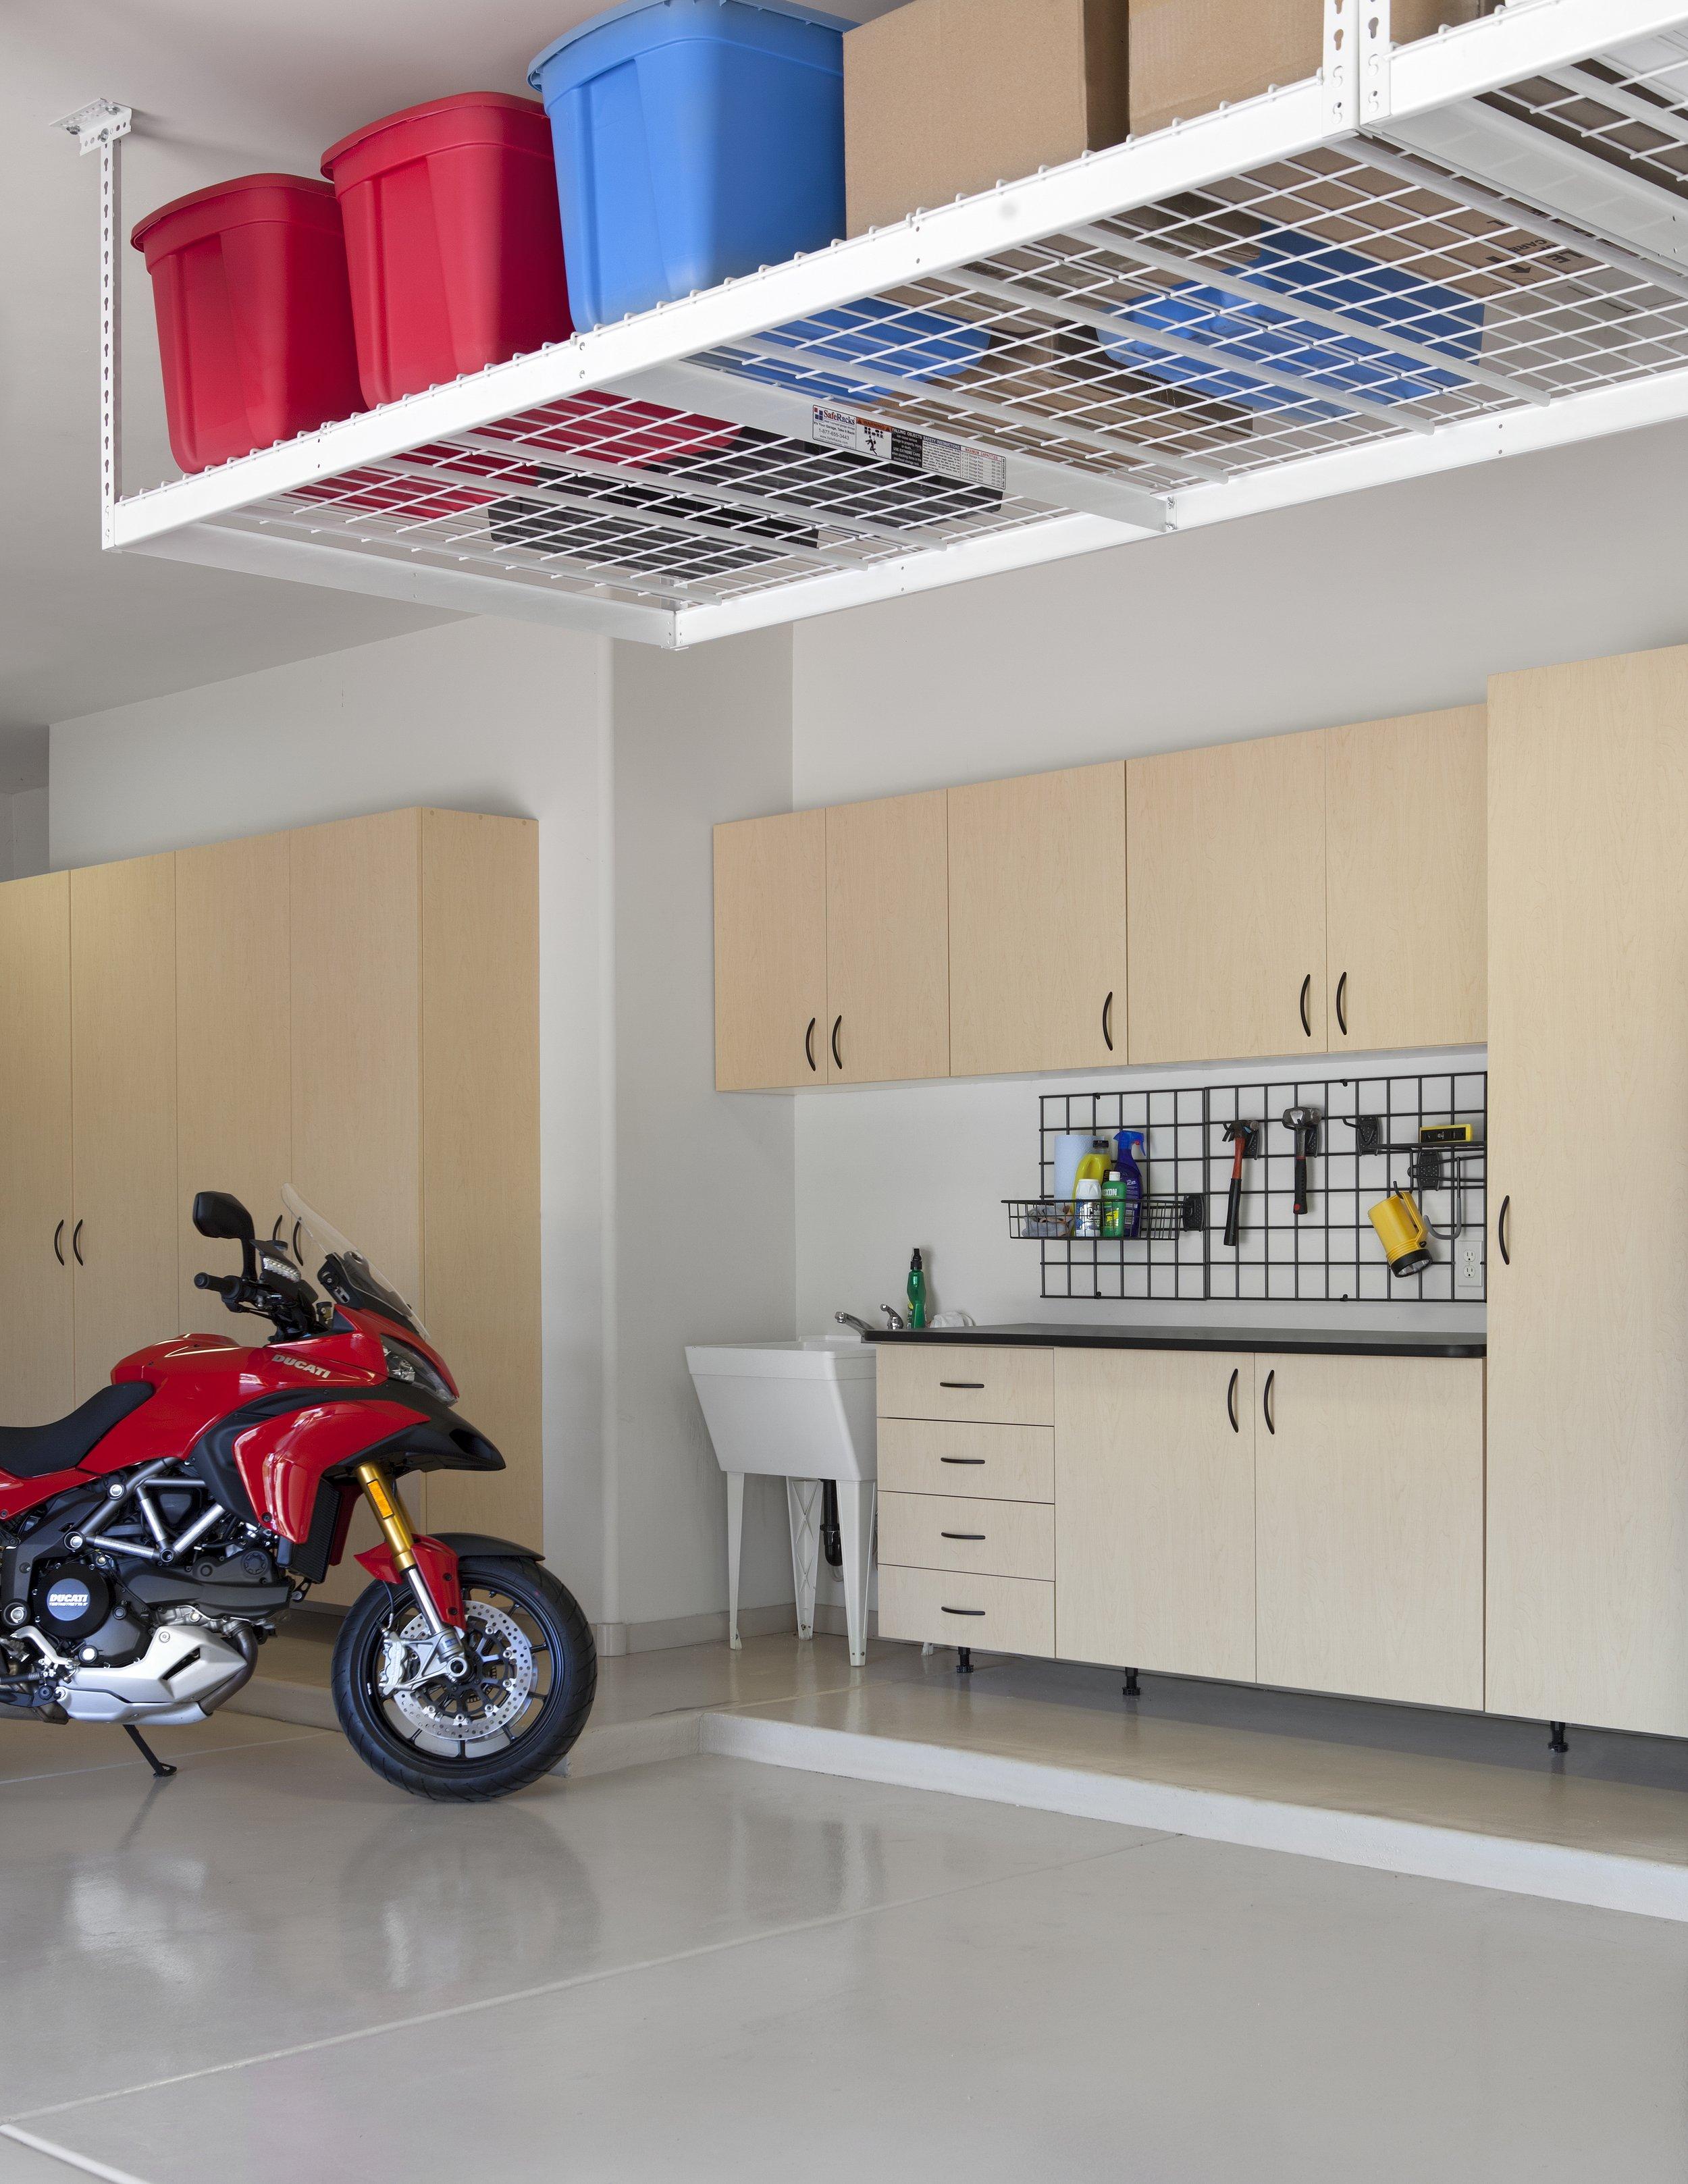 Maple Cabinets-Ebony Star Workbench-Overhead Storage-motorcycle-angle 2012.jpg